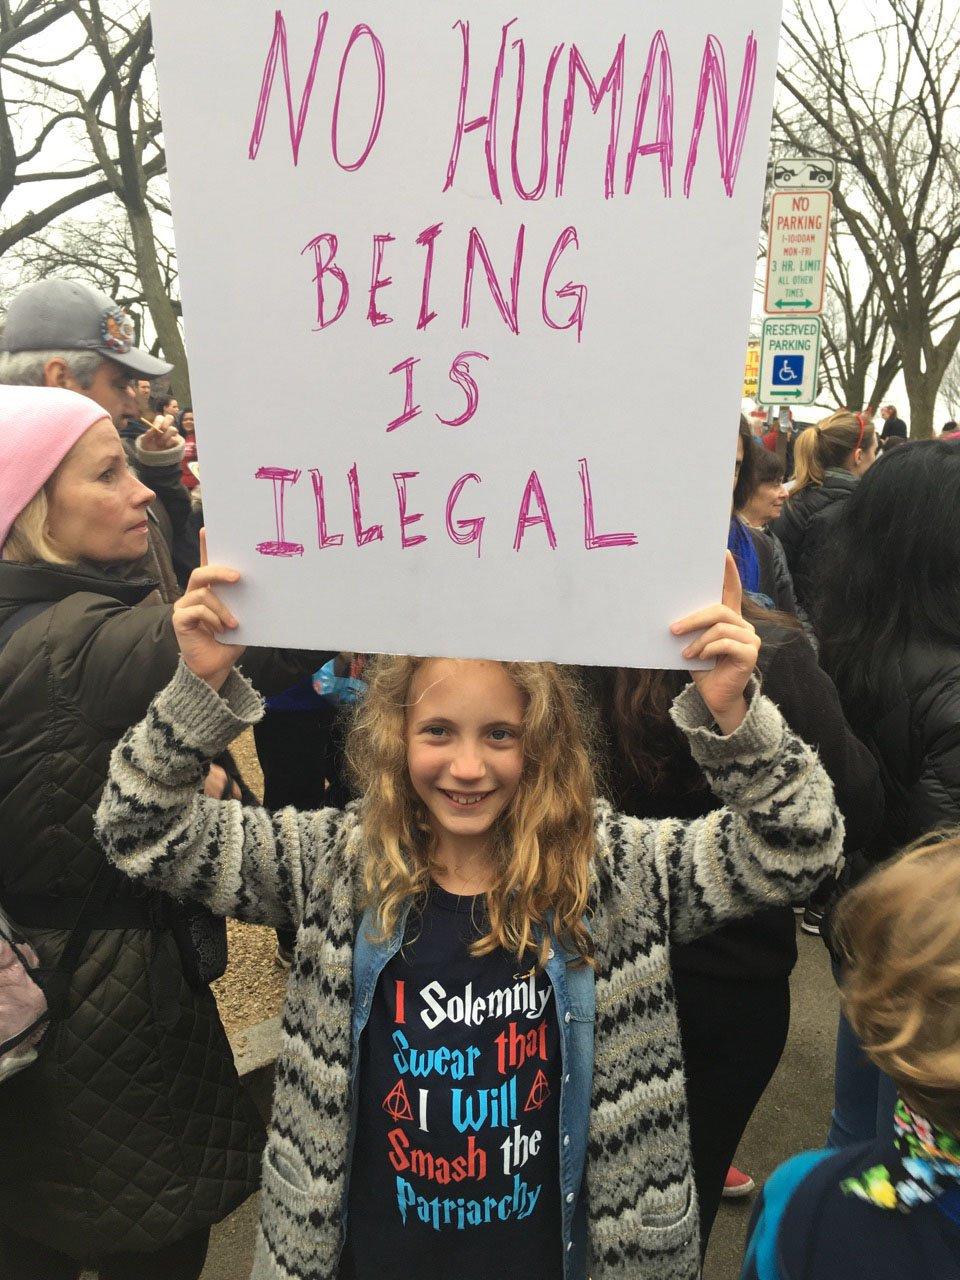 human_legal_dc_march_meghan_werft.jpg